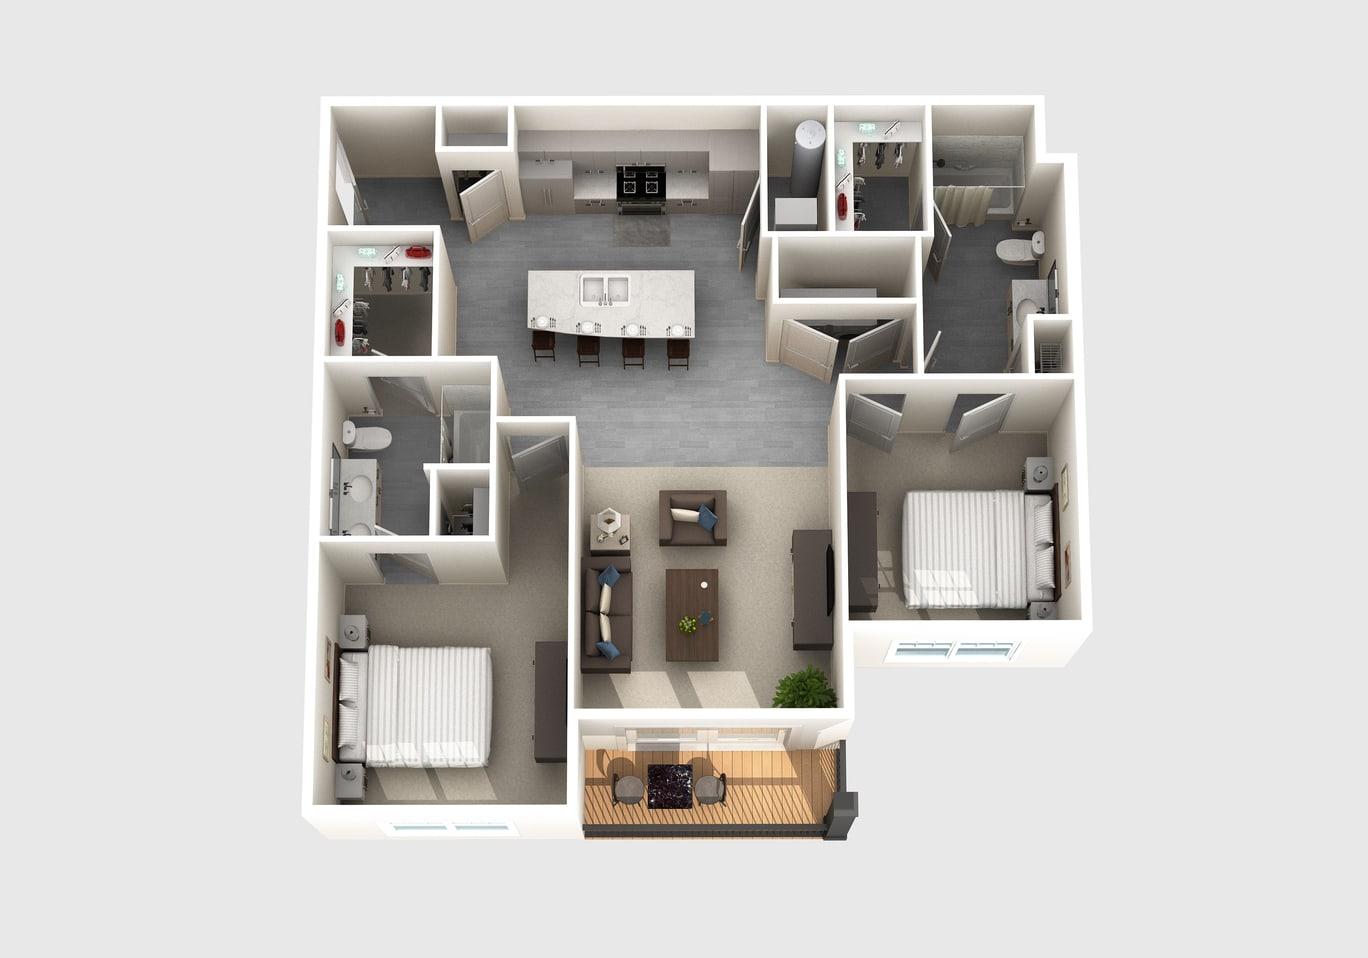 The Fulton floor plan